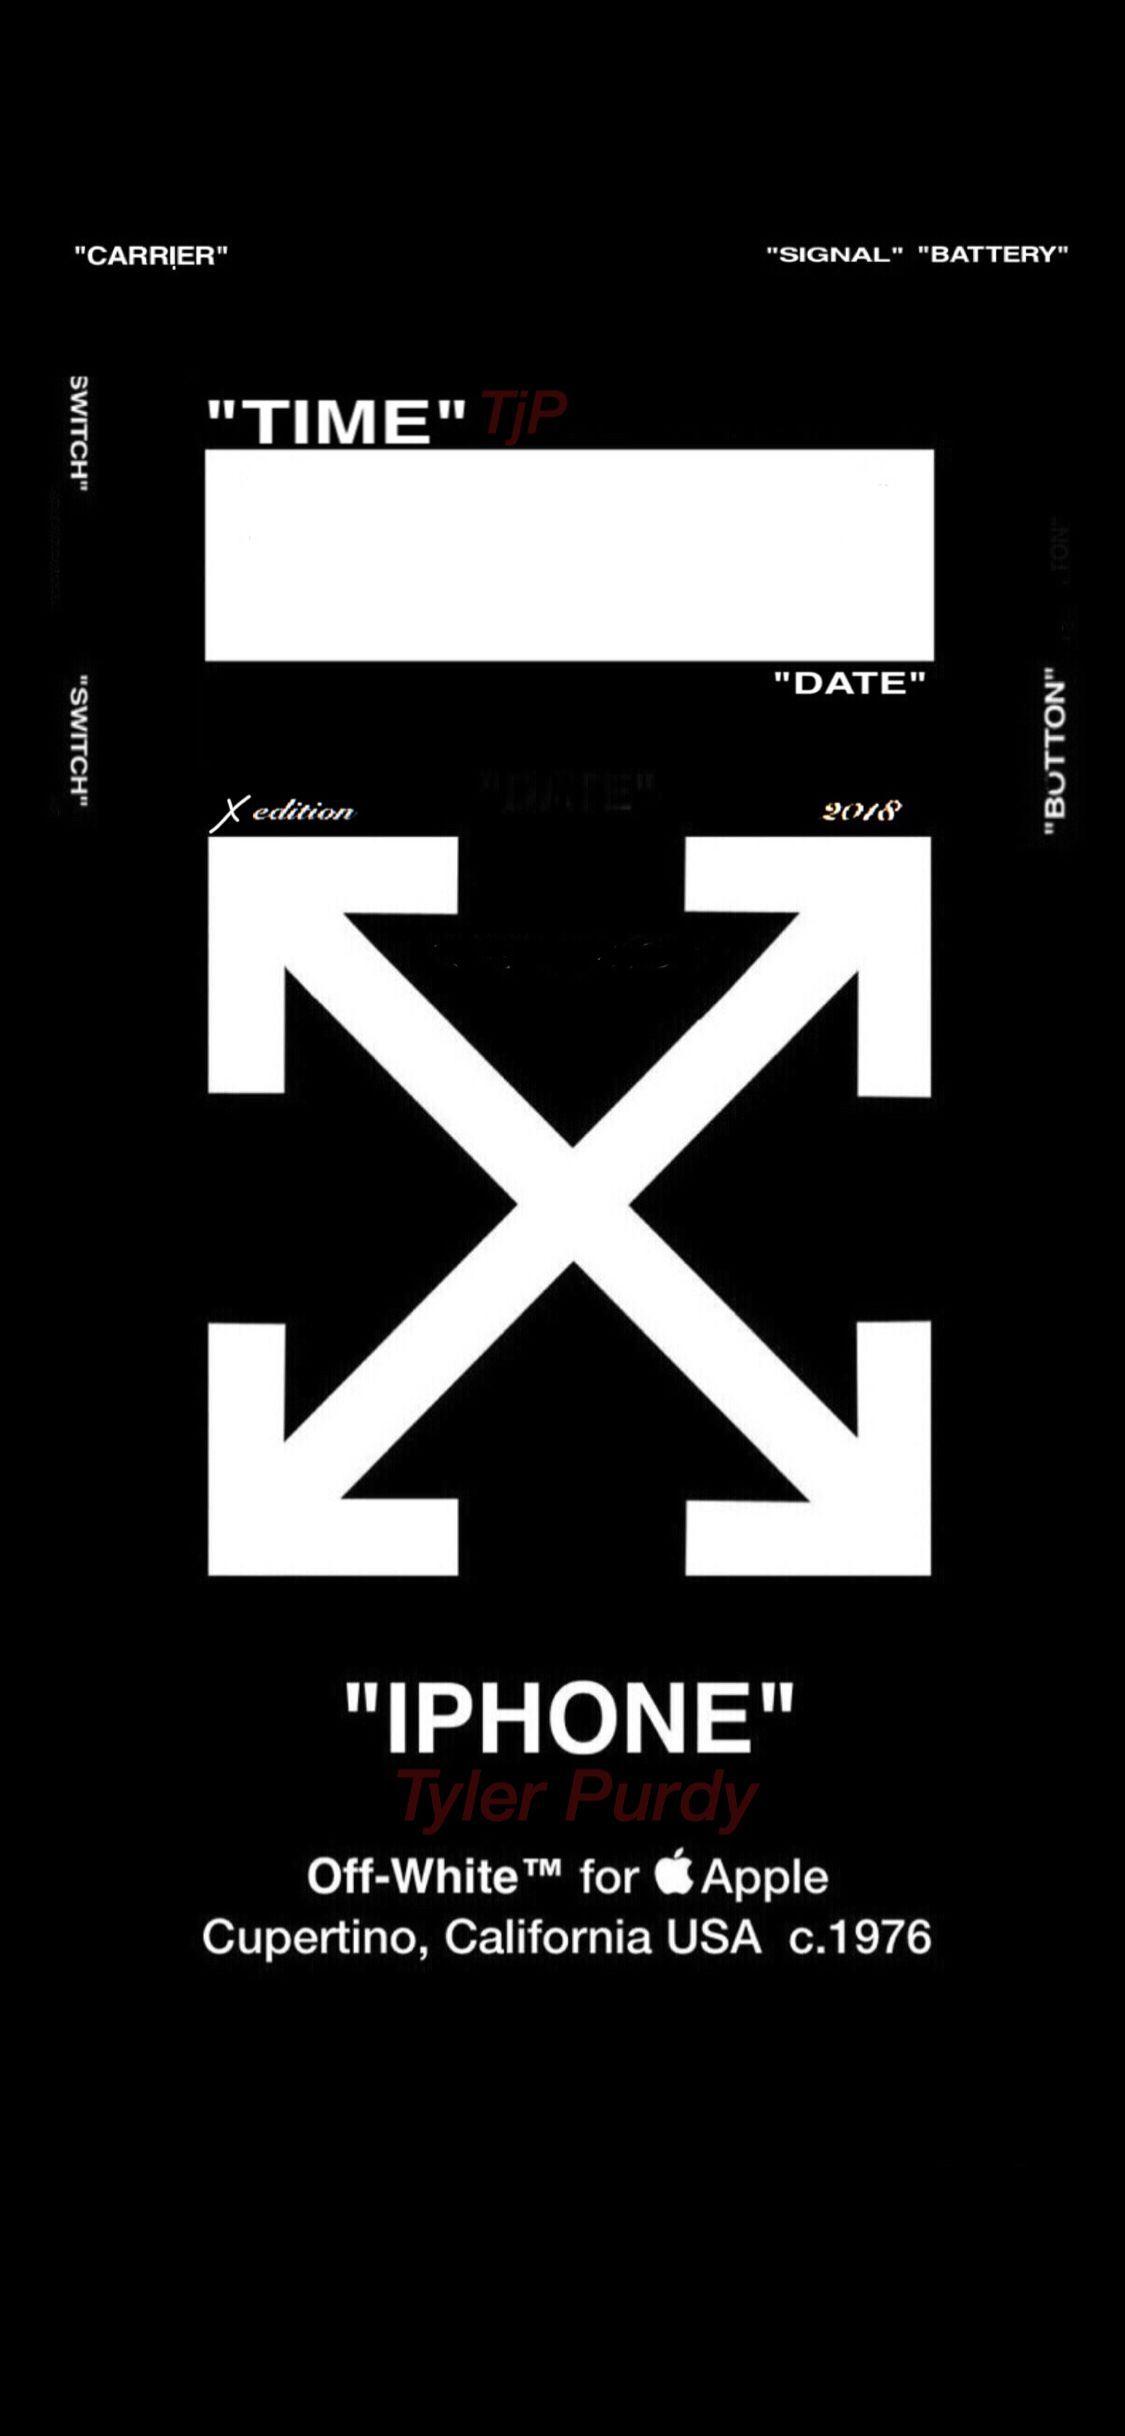 Lock Screen Off White Wallpaper Iphone Xs Max White Wallpaper For Iphone Iphone Wallpaper Off White Lock Screen Wallpaper Iphone